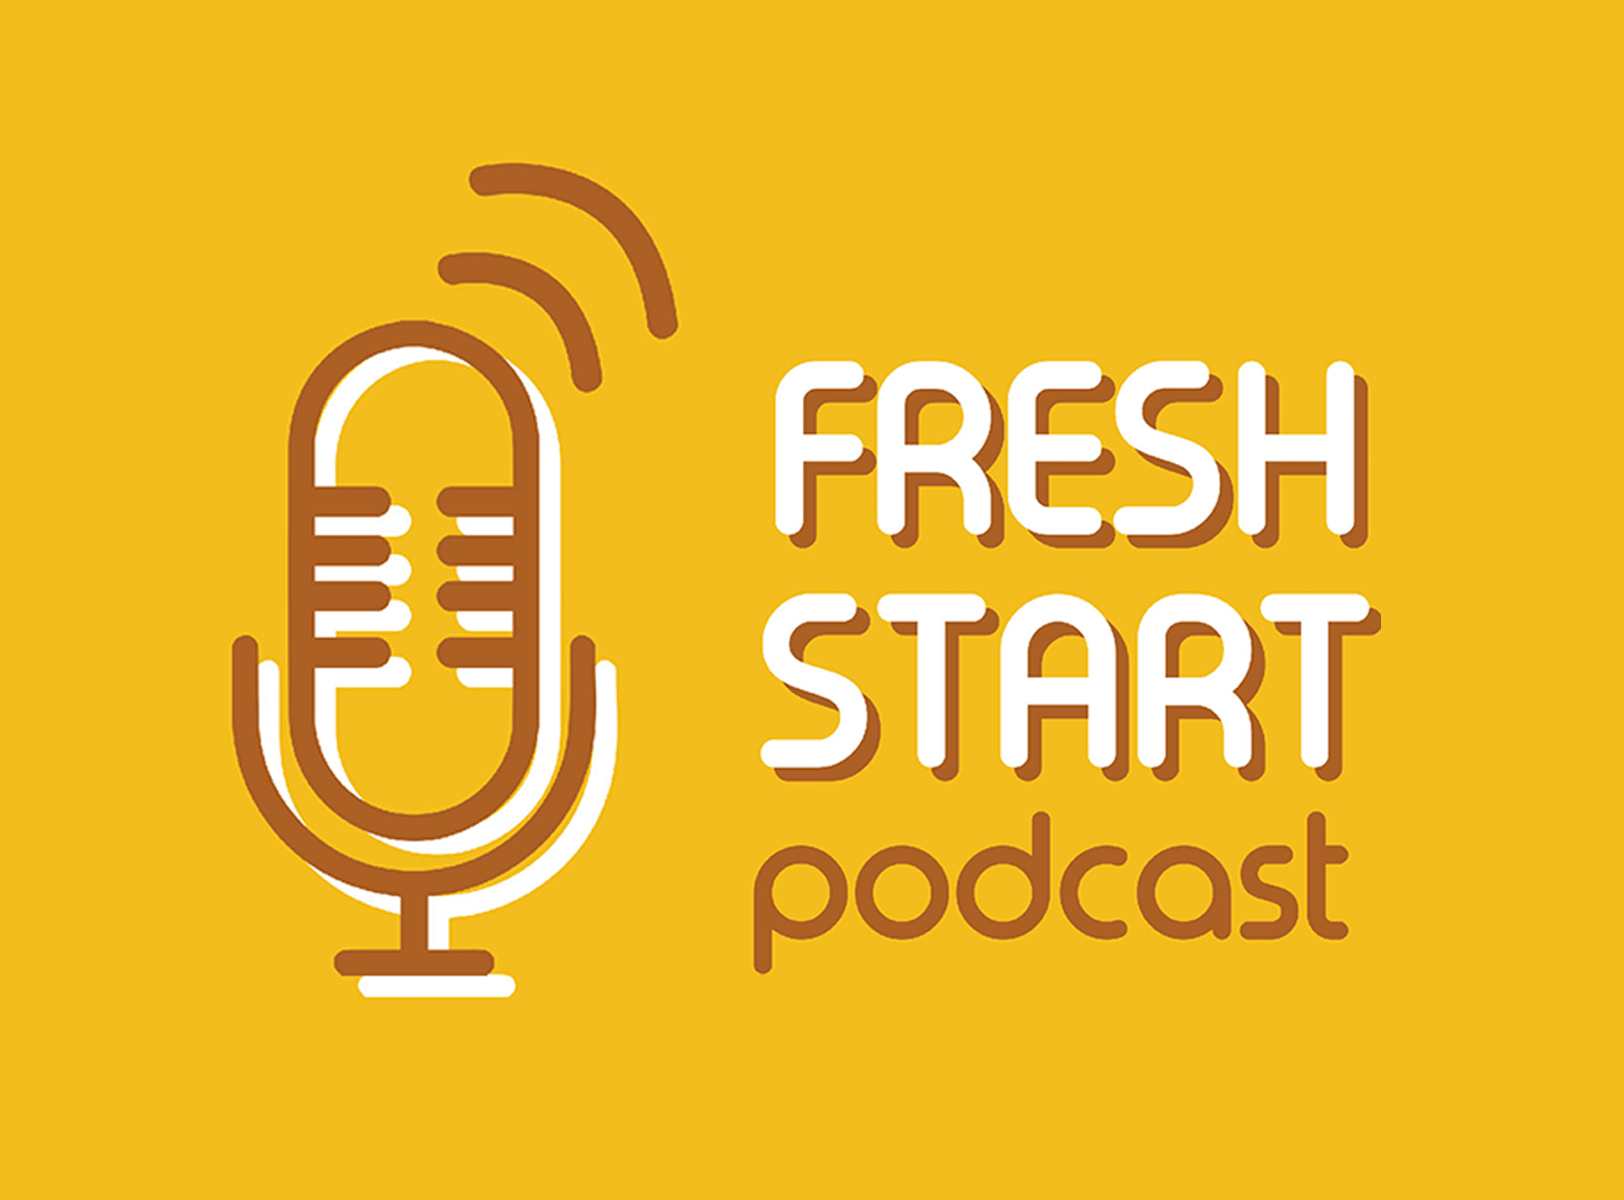 Fresh Start: Podcast News (2/20/2019 Wed.)